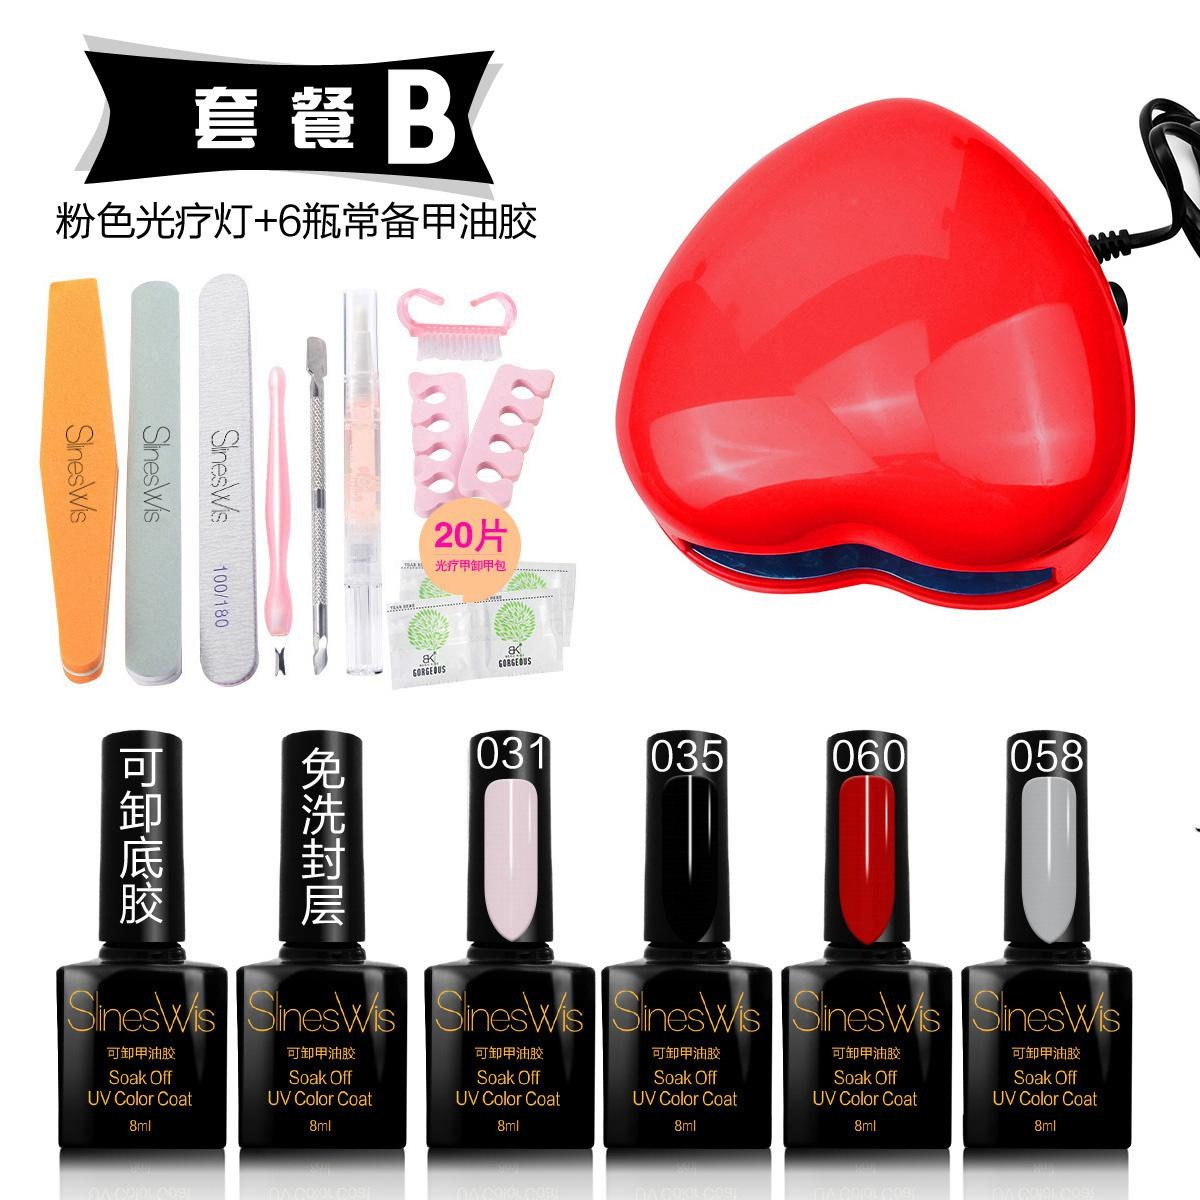 Set Manicure glue nail polish sticker lamp phototherapy rubber soles seal adhesive Manicure machine tool set